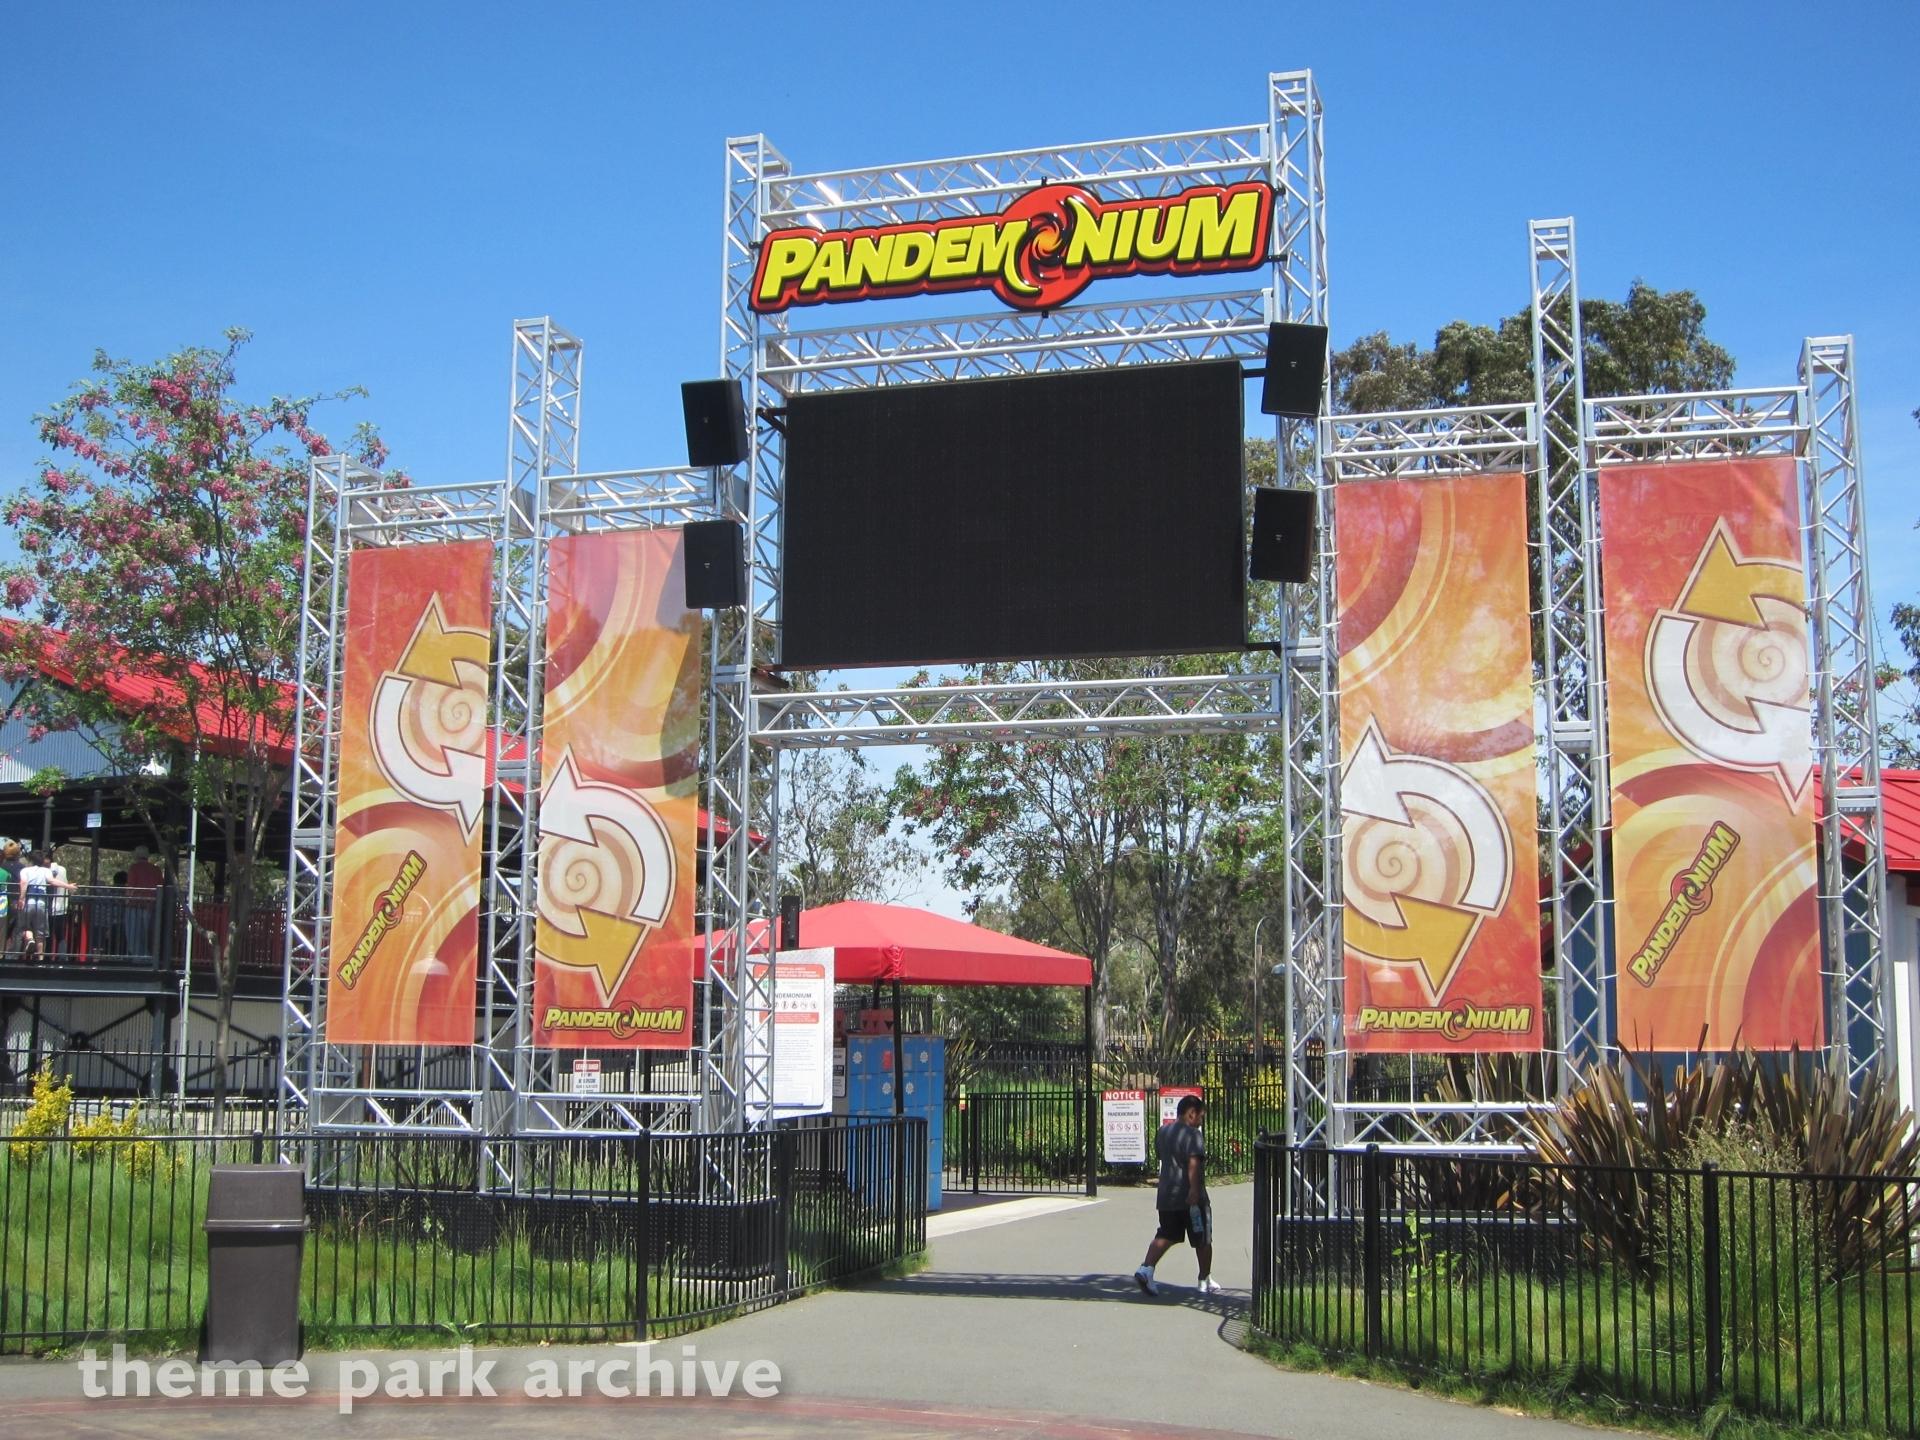 Pandemonium at Six Flags Discovery Kingdom